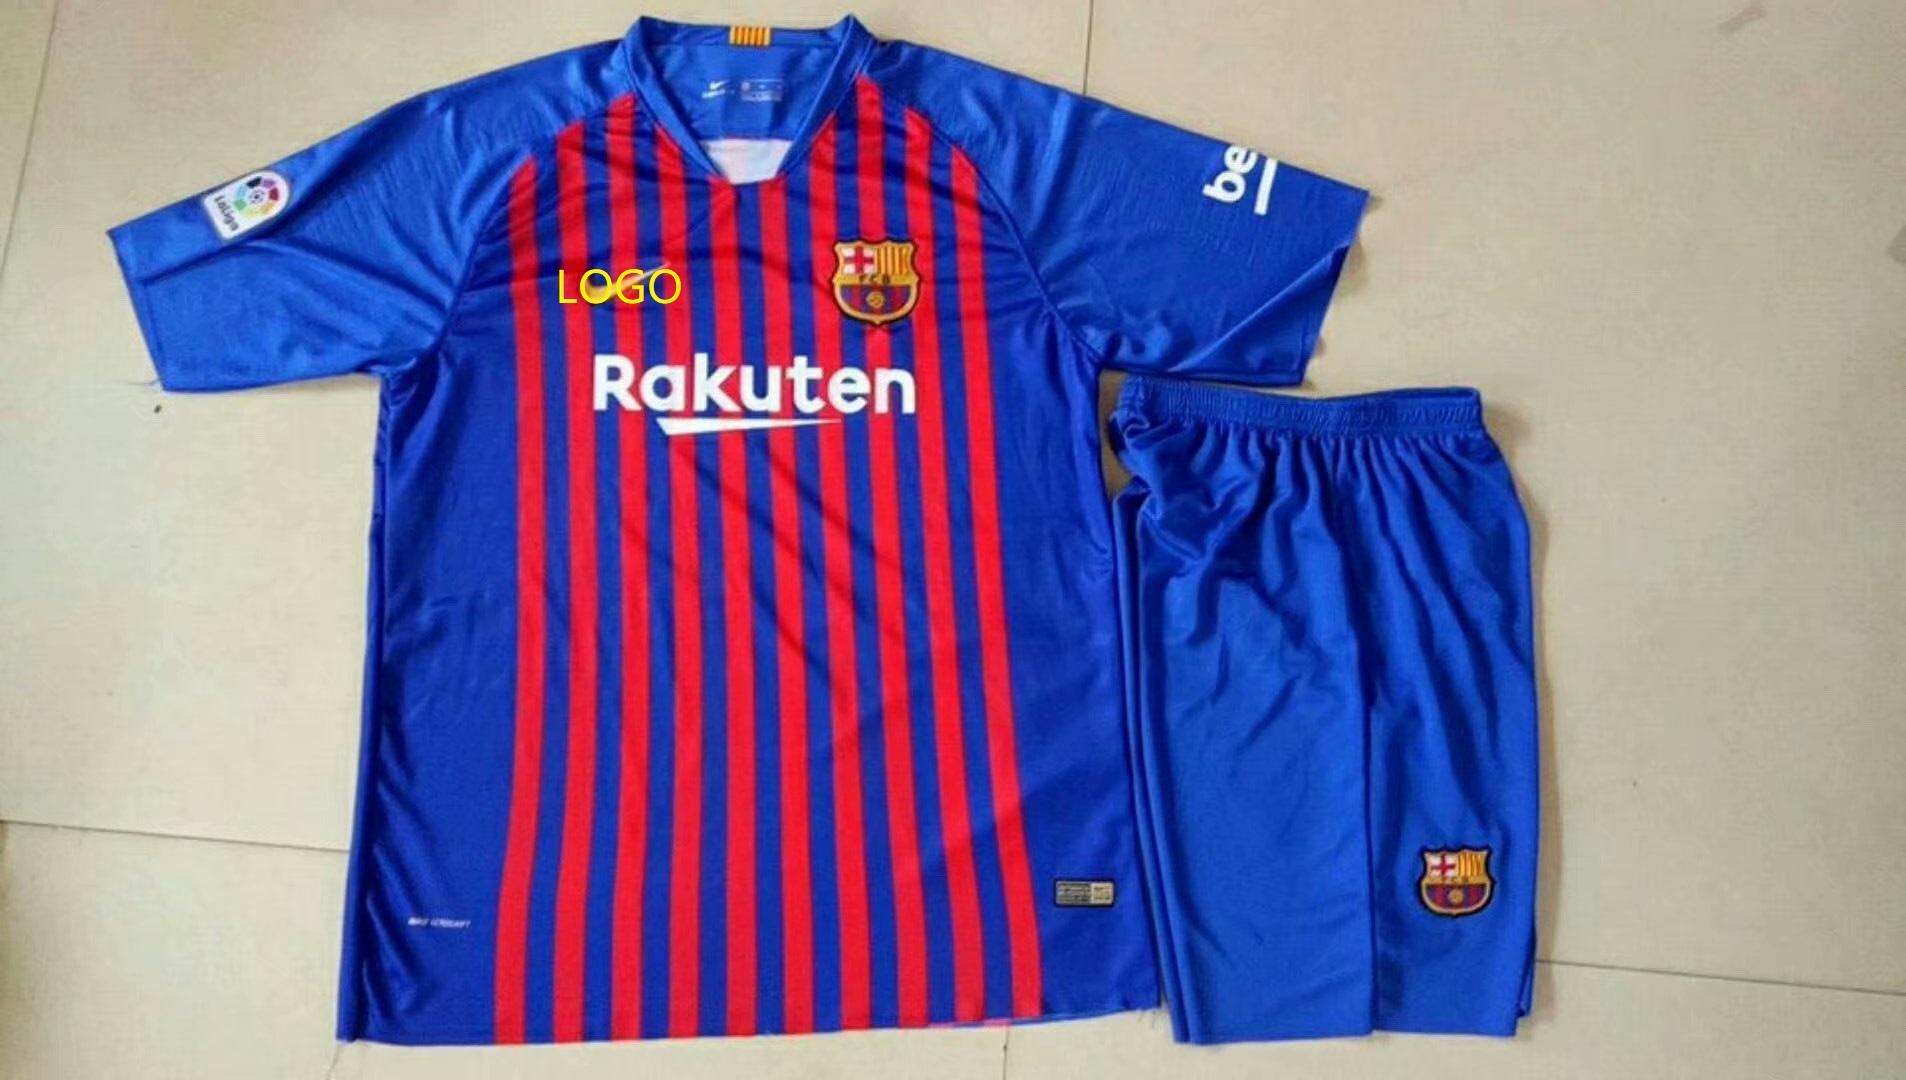 f8100a9761a 18 19 Adult Barcelona Home Soccer Uniform Men Football Jersey Wholesale  Custom Name uniforme de fútbol Item NO  526783